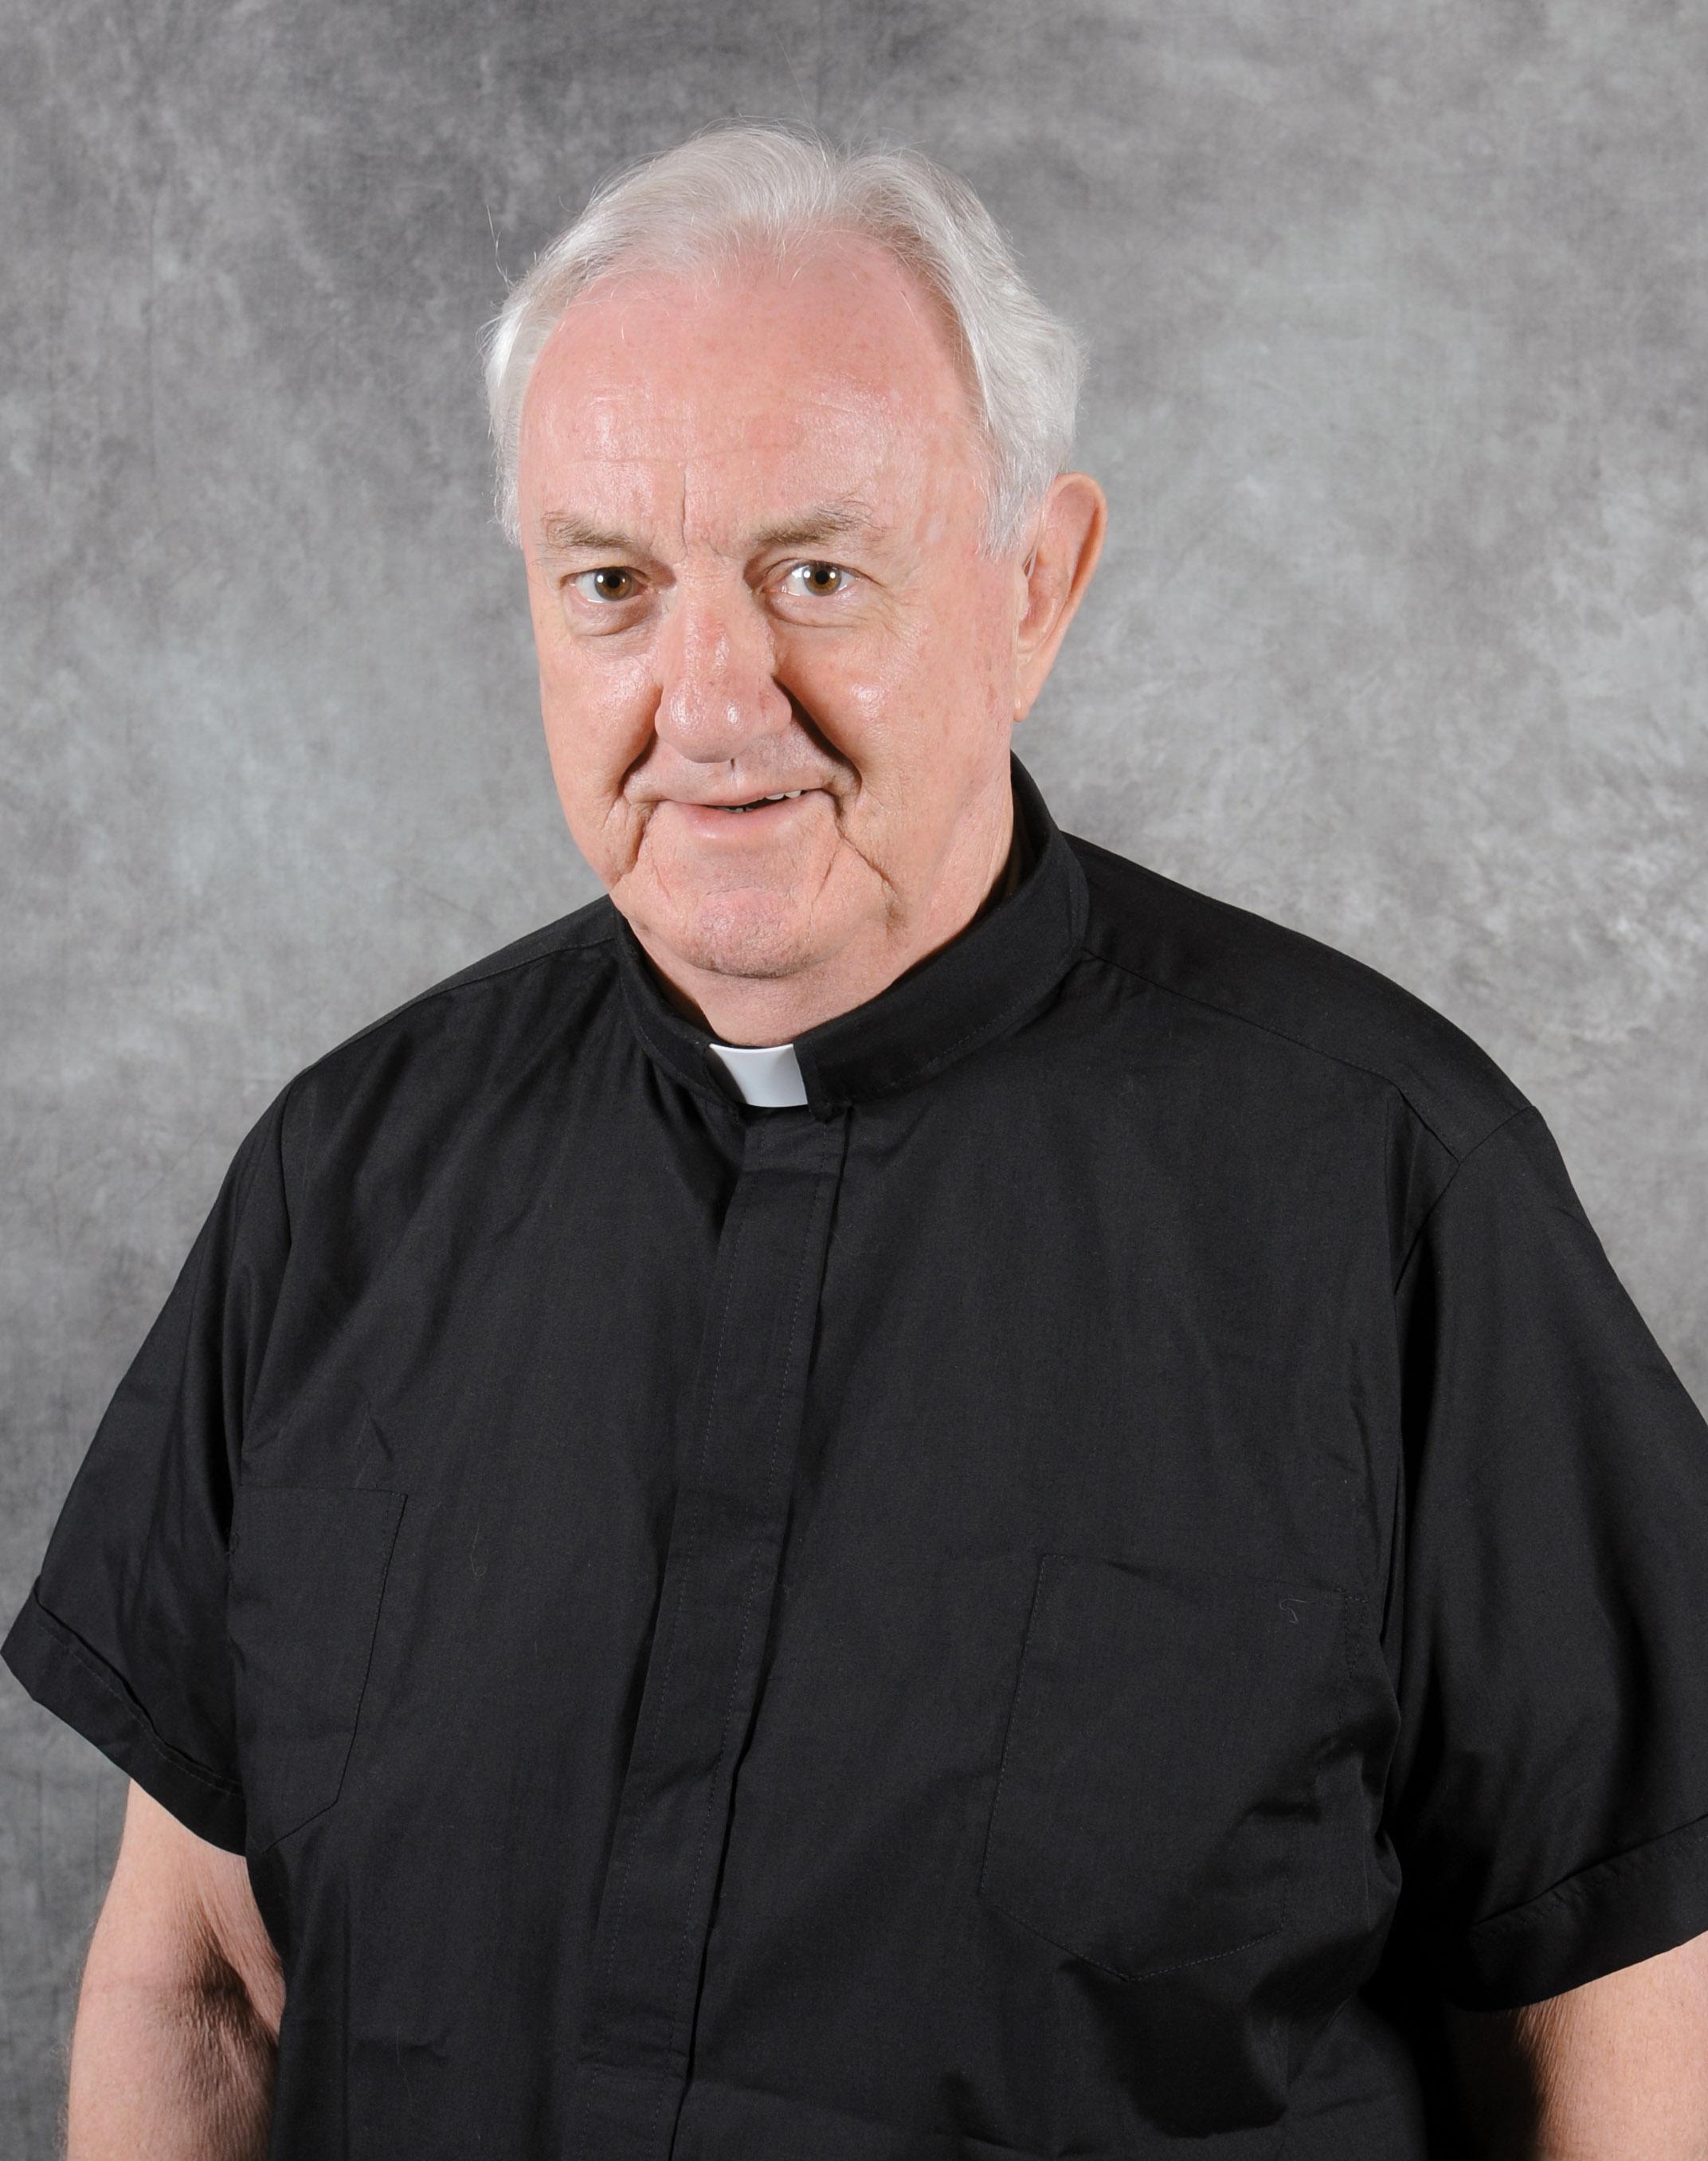 Monsignor Thomas Cahalane